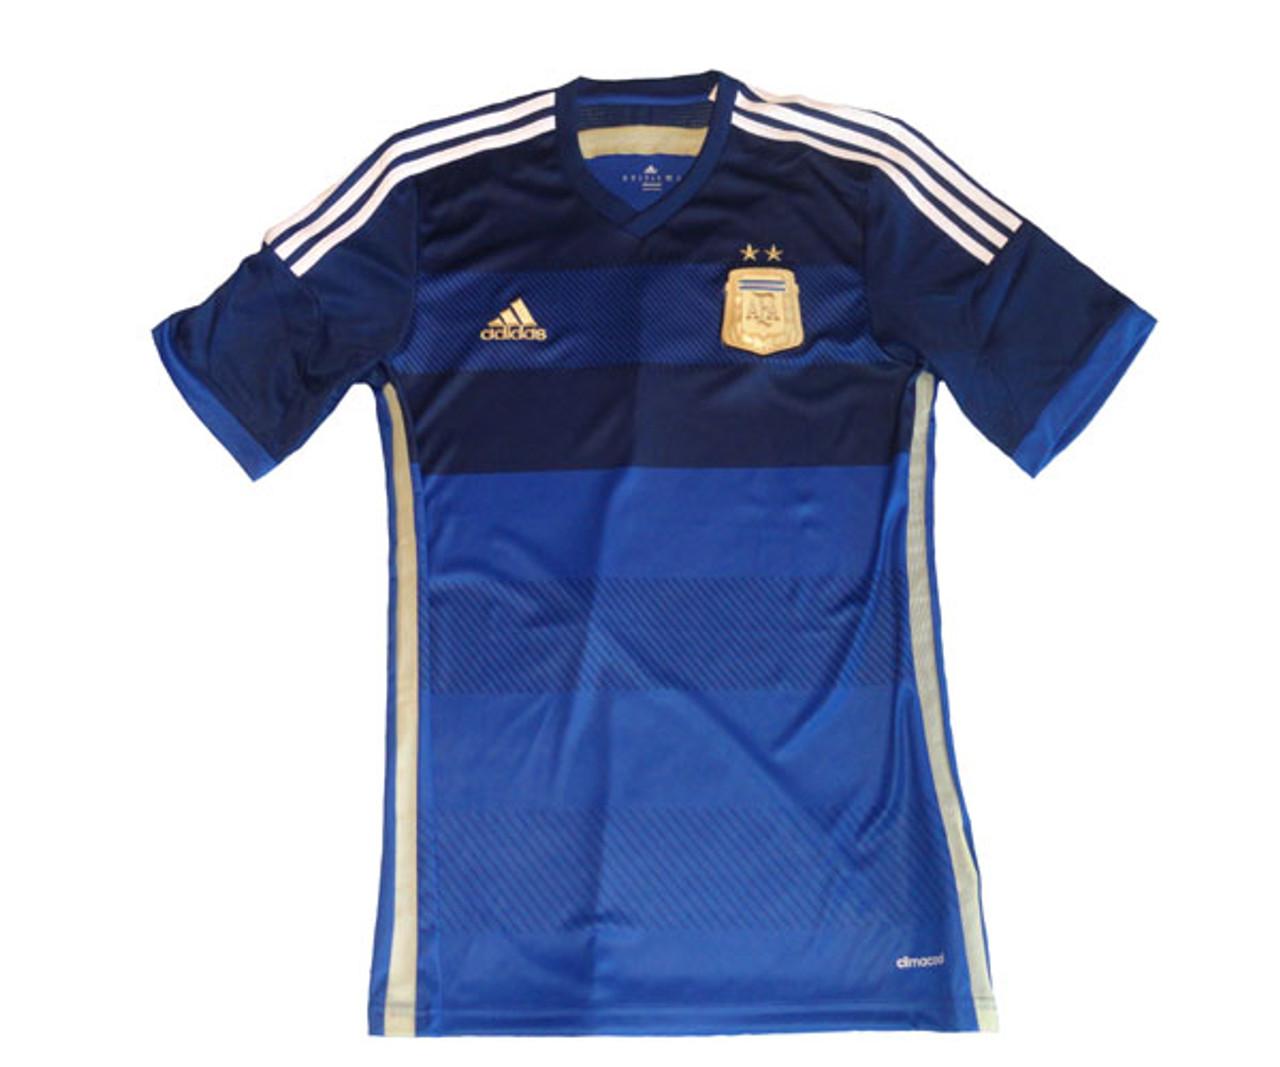 adidas shirt blue